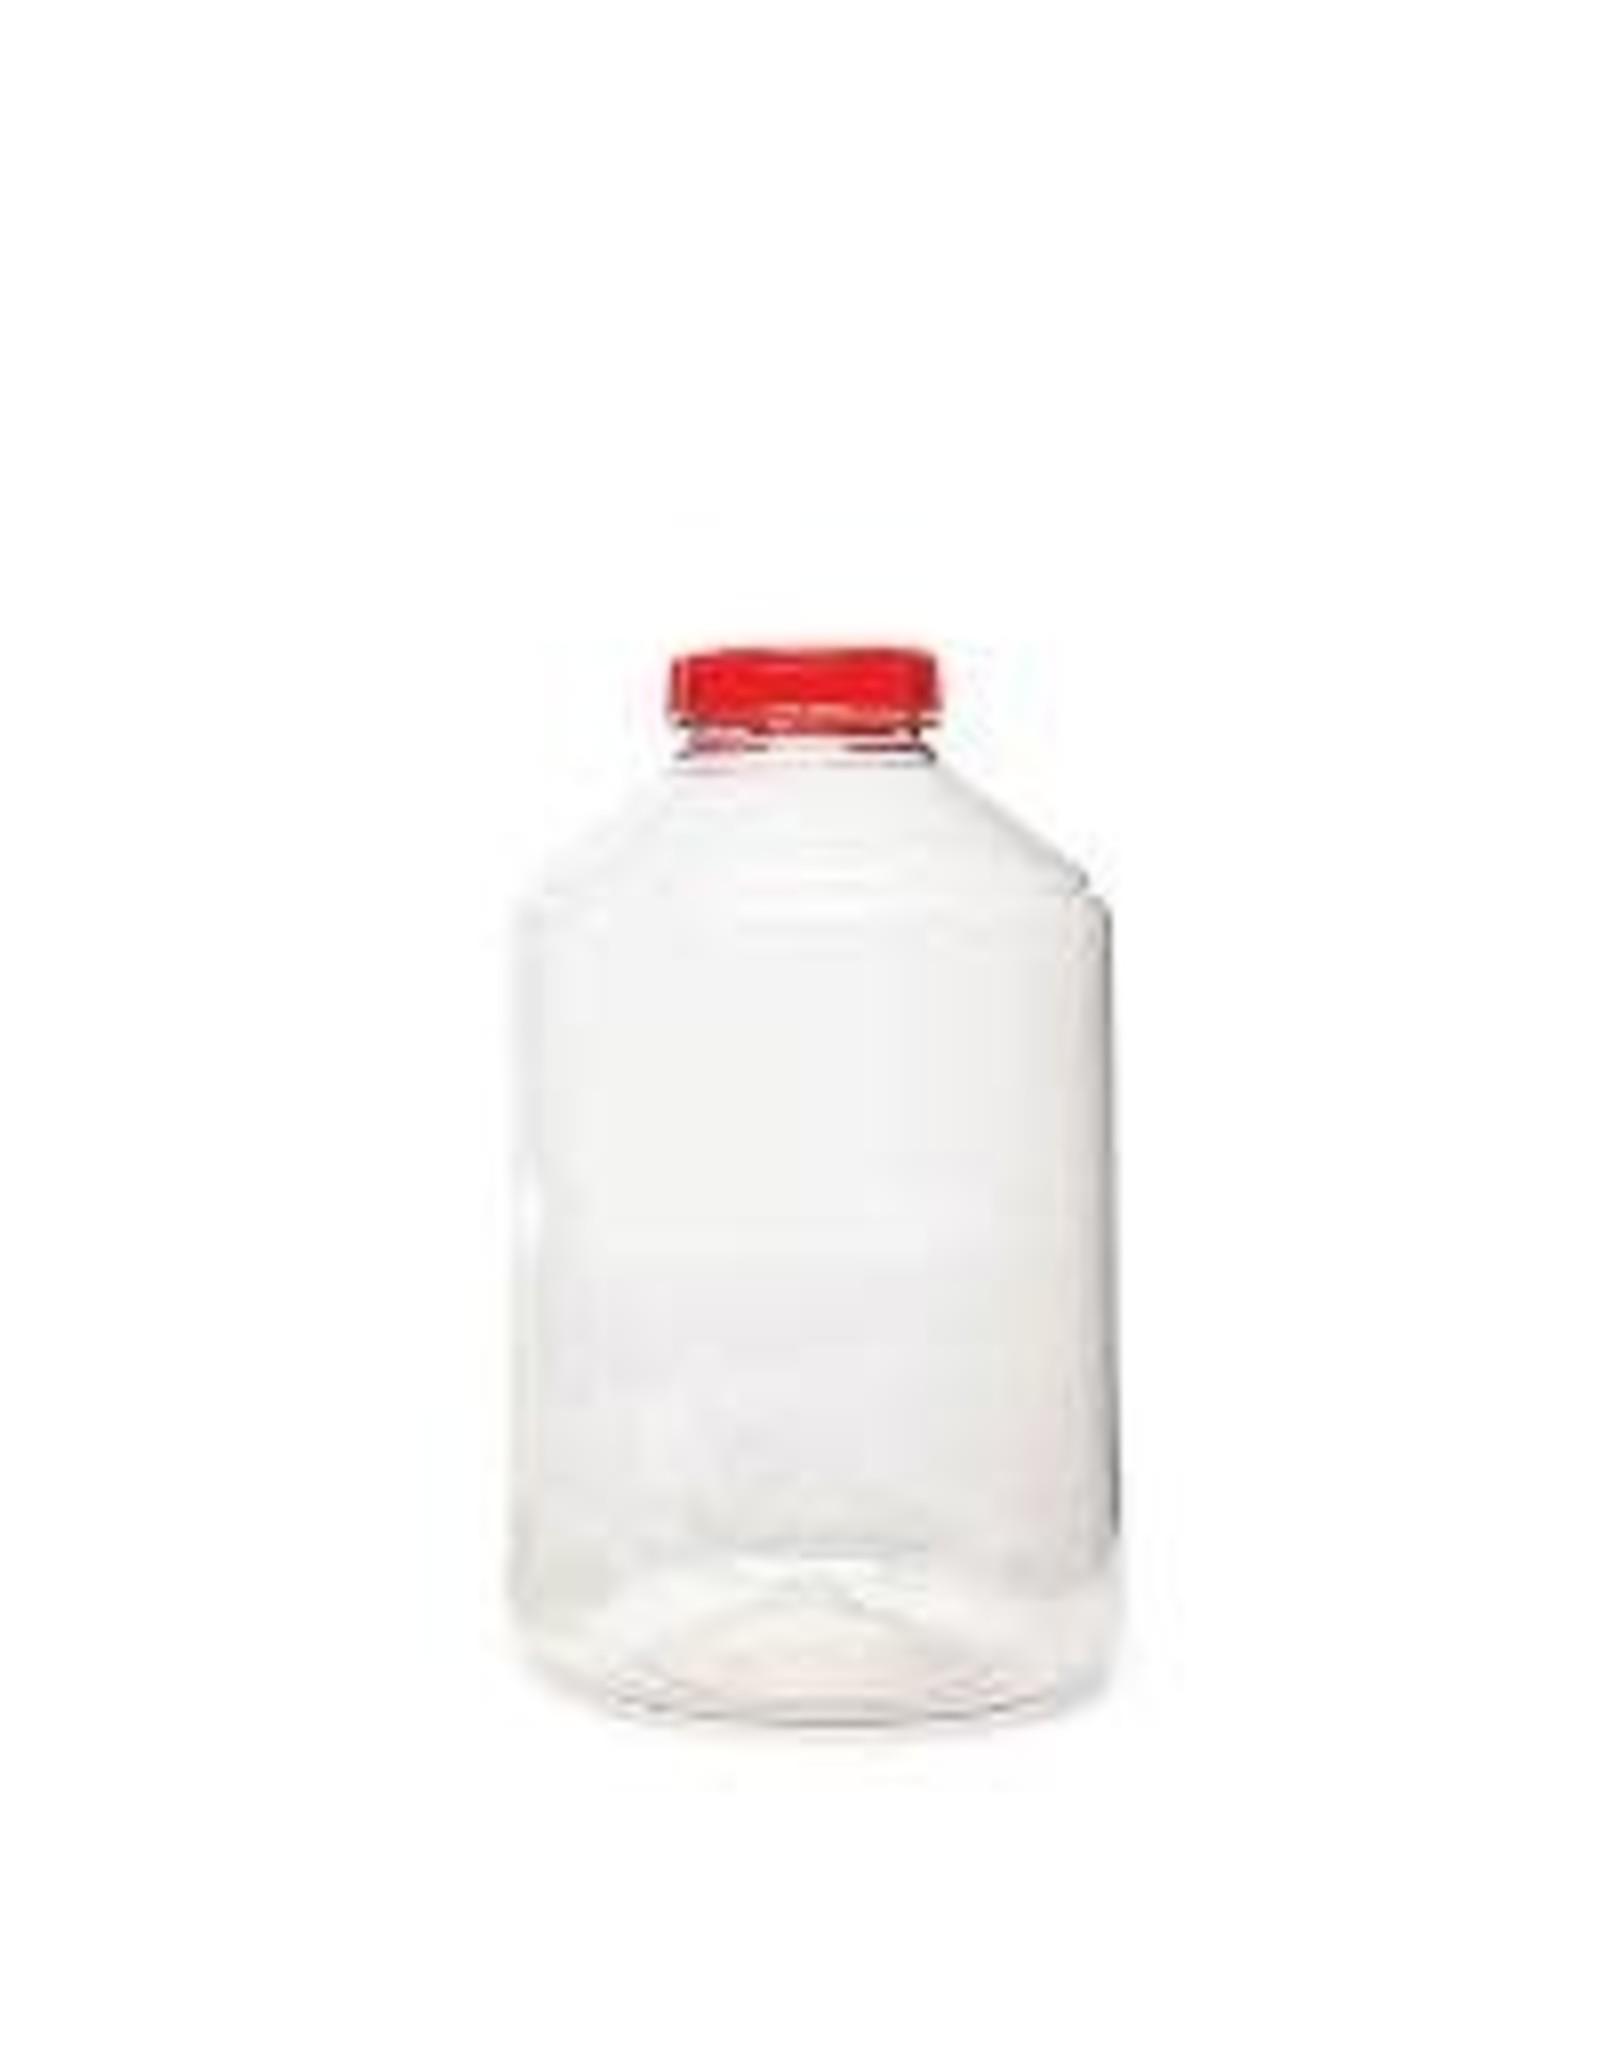 1 GALLON PLASTIC FERMONSTER